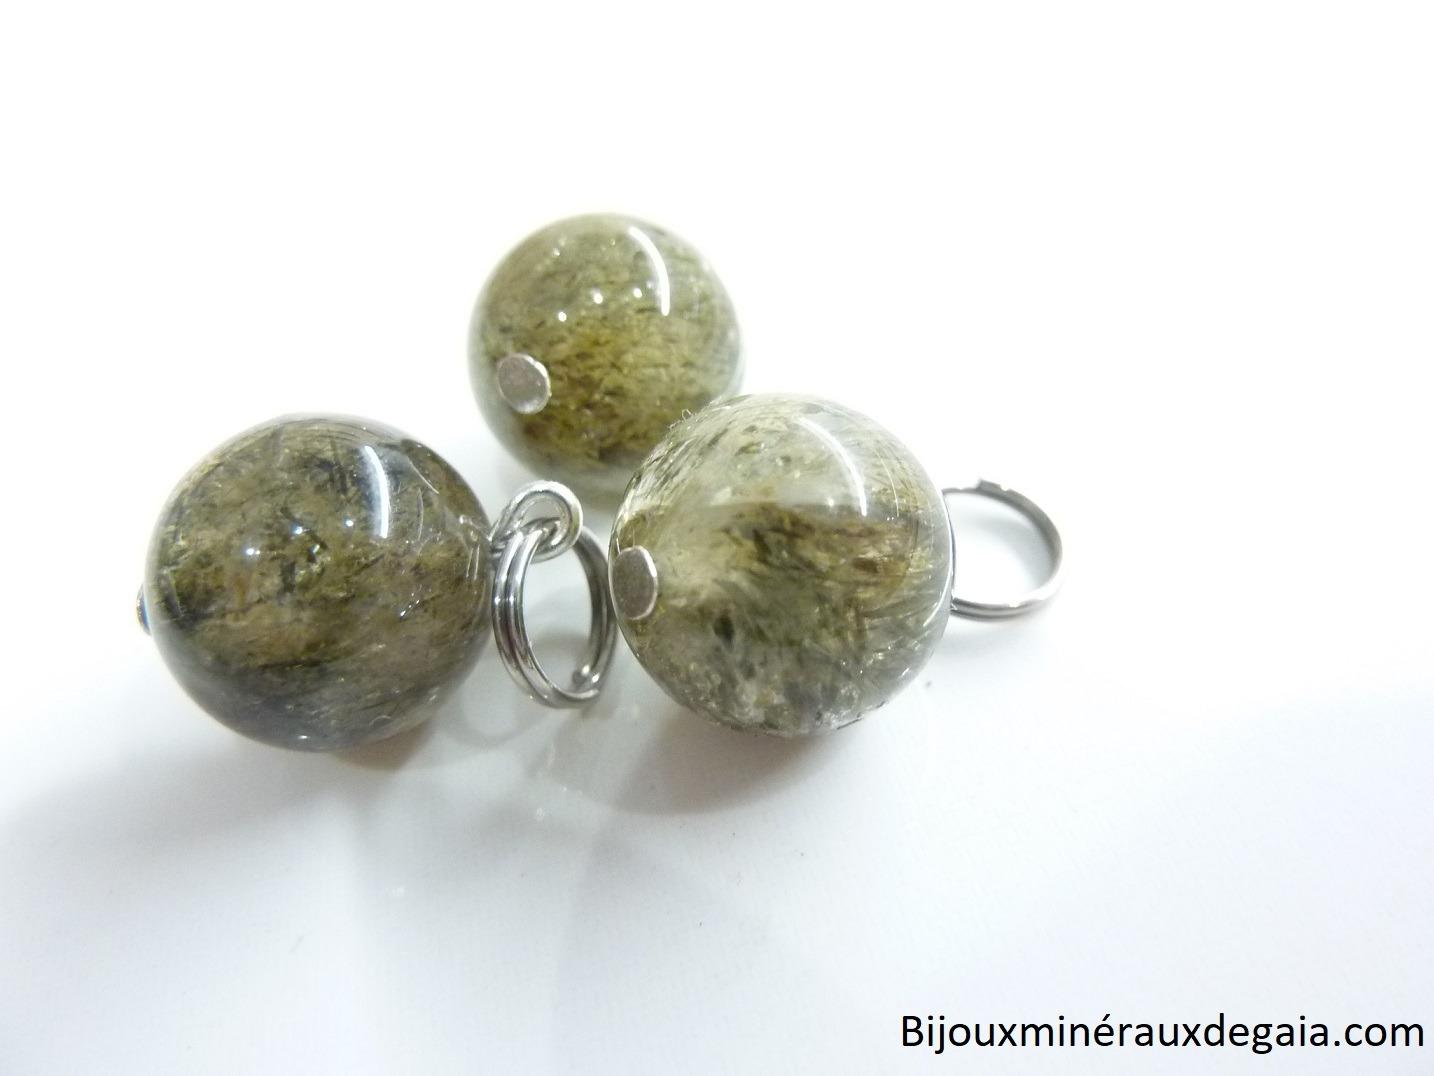 Pendentif quartz tourmaliné verte rare ! Perles rondes 12 mm